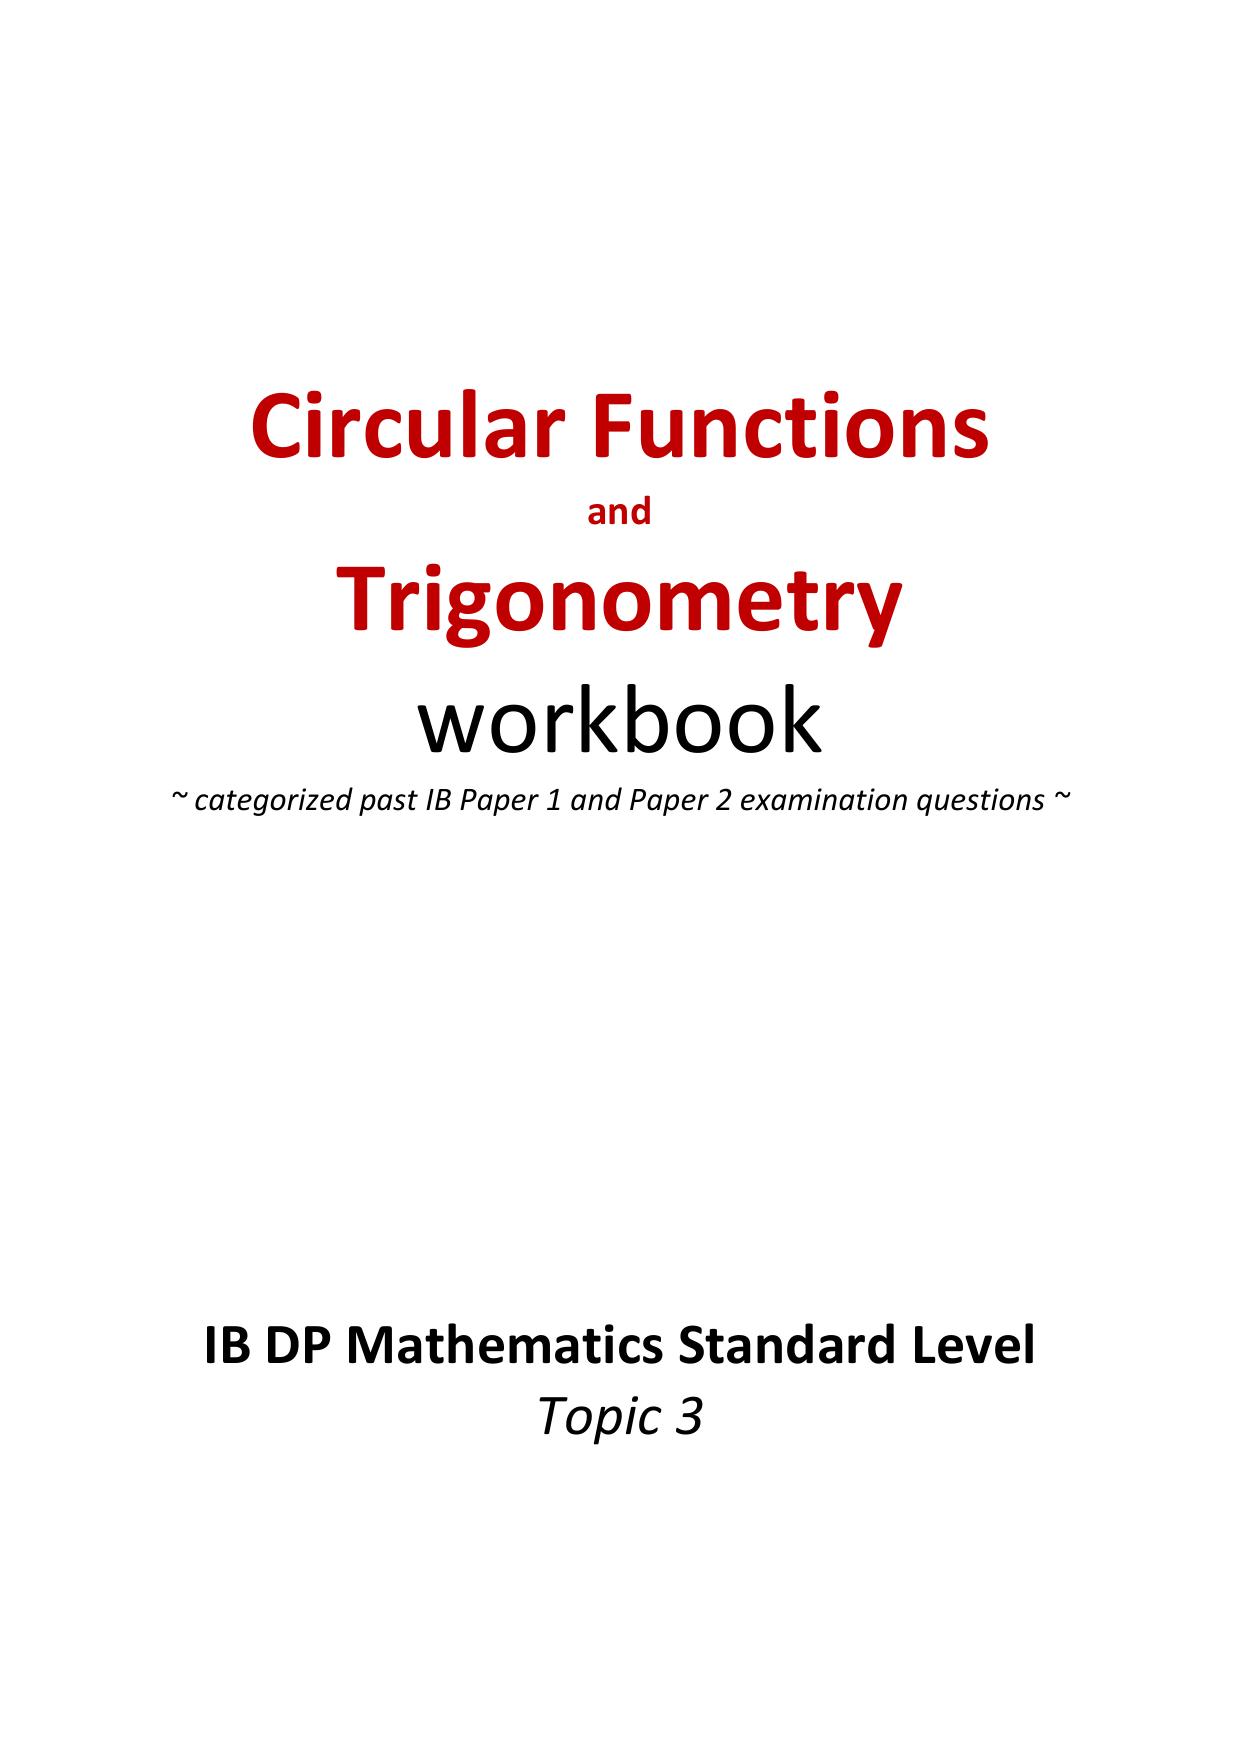 Topic 3 Trigonometry question bank questions